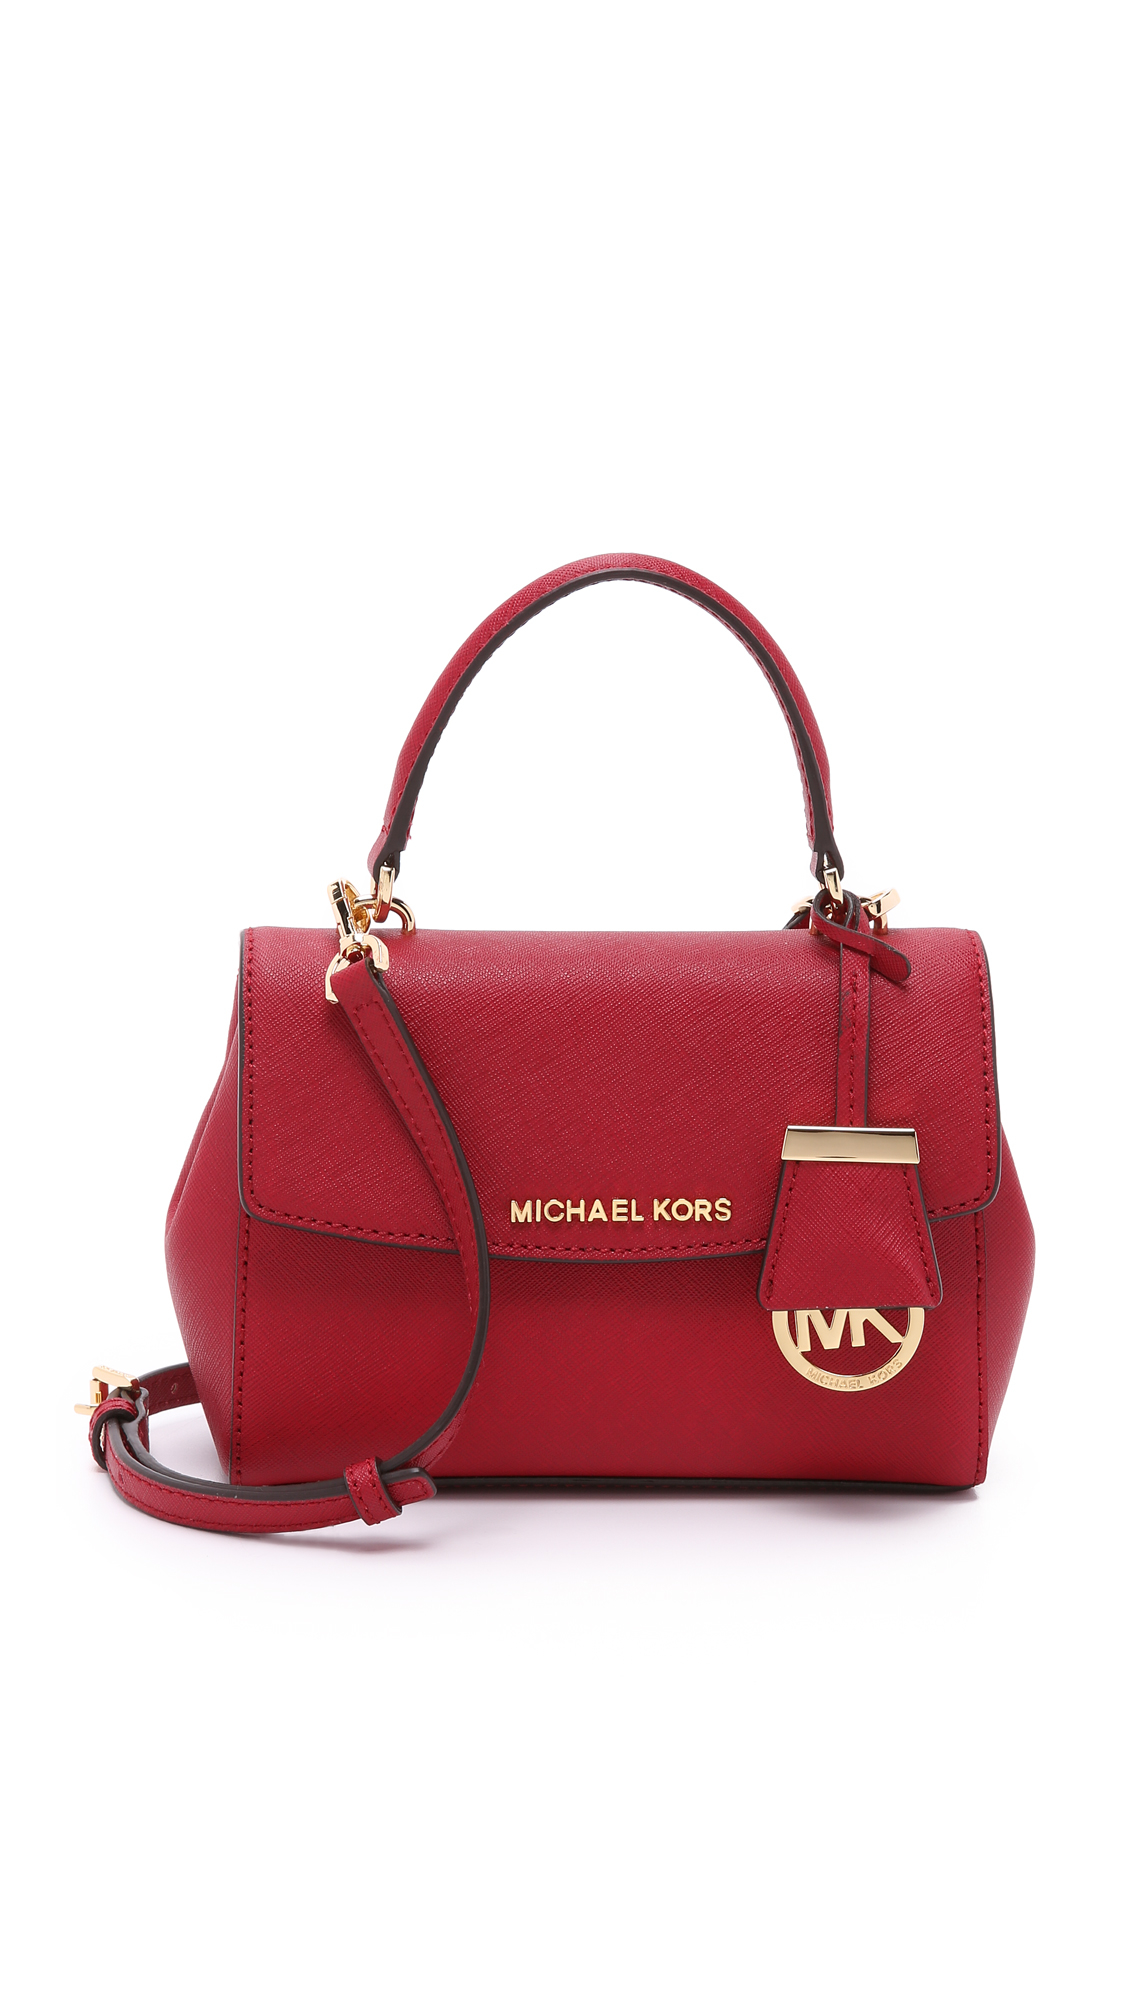 989fb74c3d01 MICHAEL Michael Kors Ava Extra Small Cross Body Bag - Cherry in Red ...